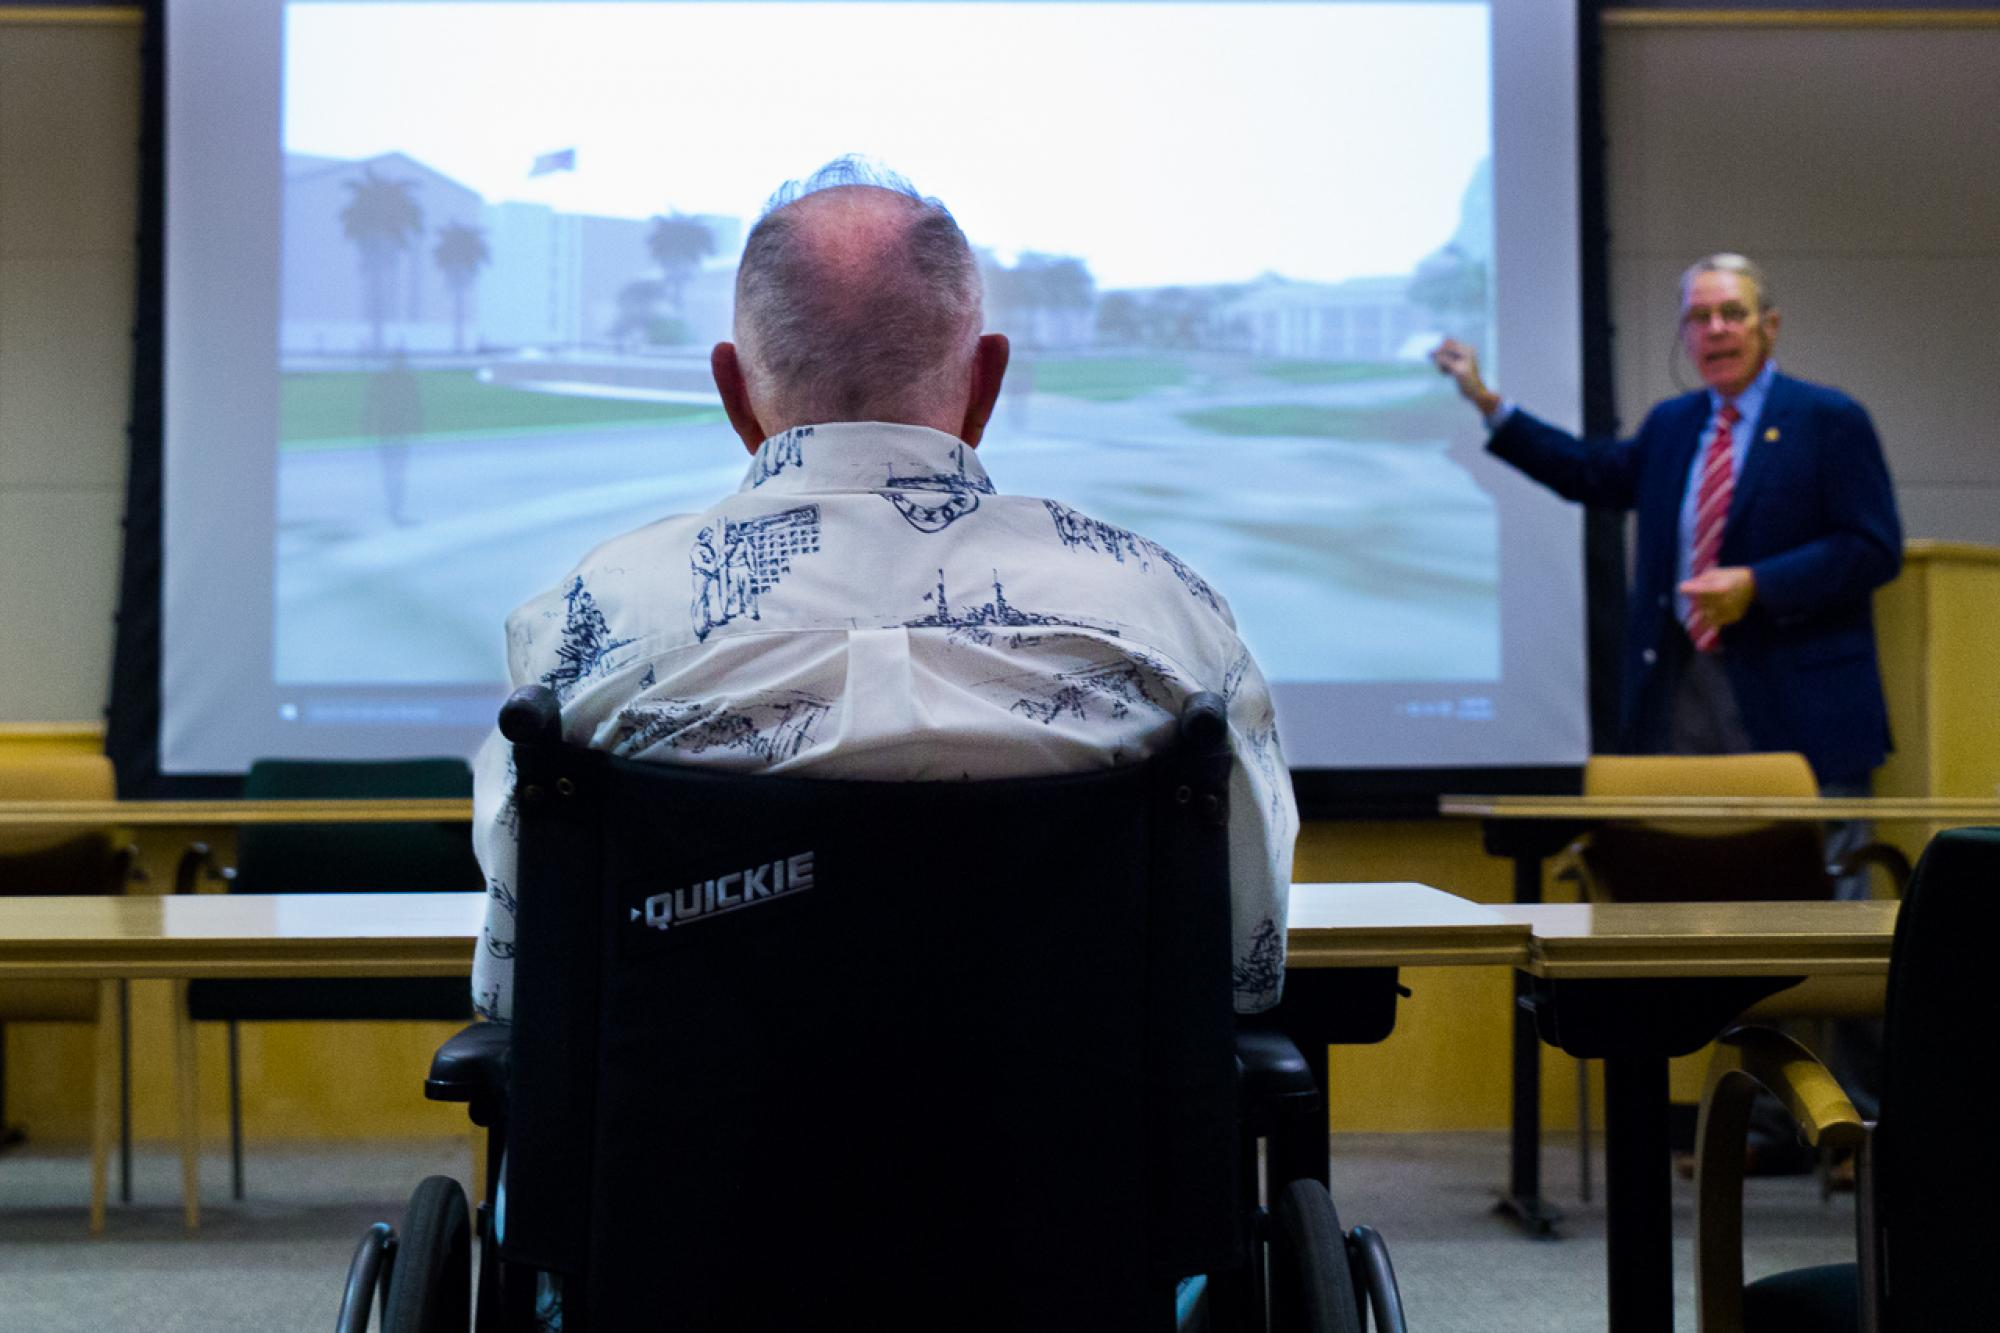 Bill Westcott presents architectural plans for the USS Arizona Mall Memorial as Lauren Bruner, a USS Arizona survivor, listens.